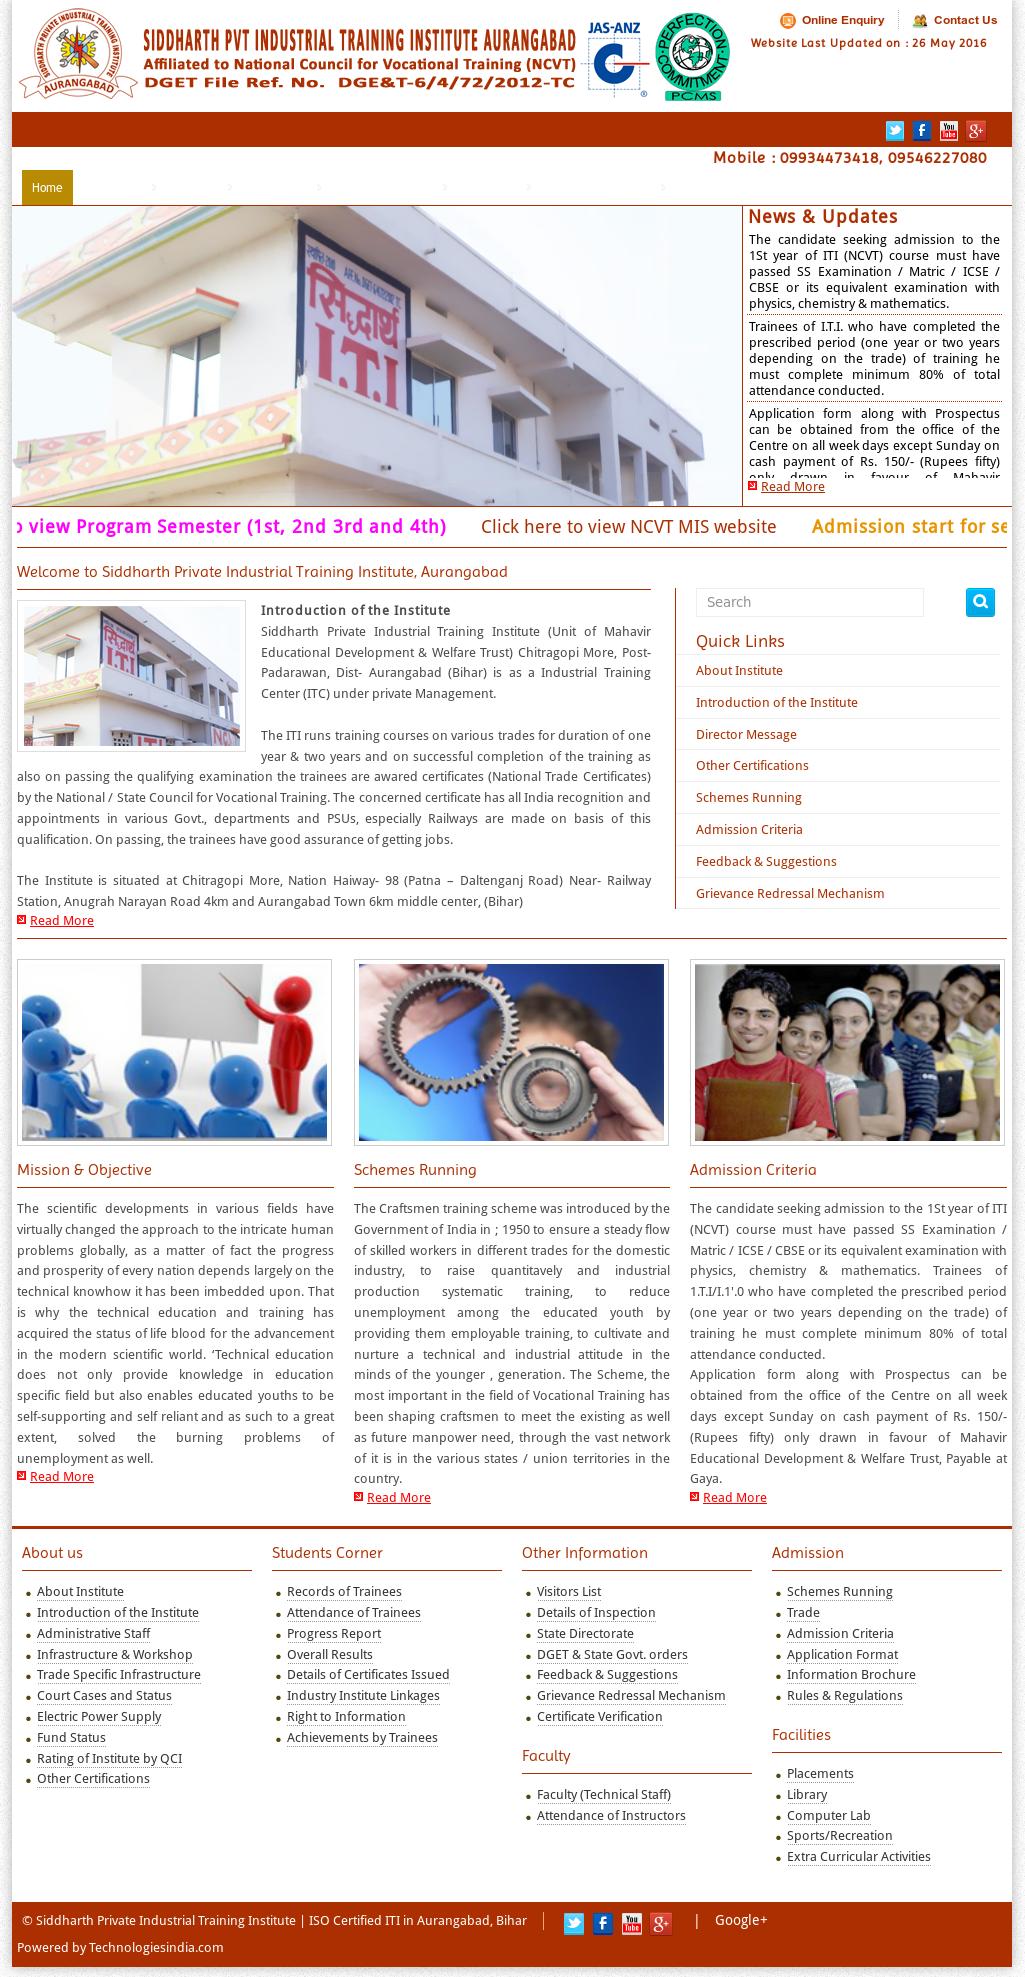 Siddharth Private Industrial Training Institute Competitors